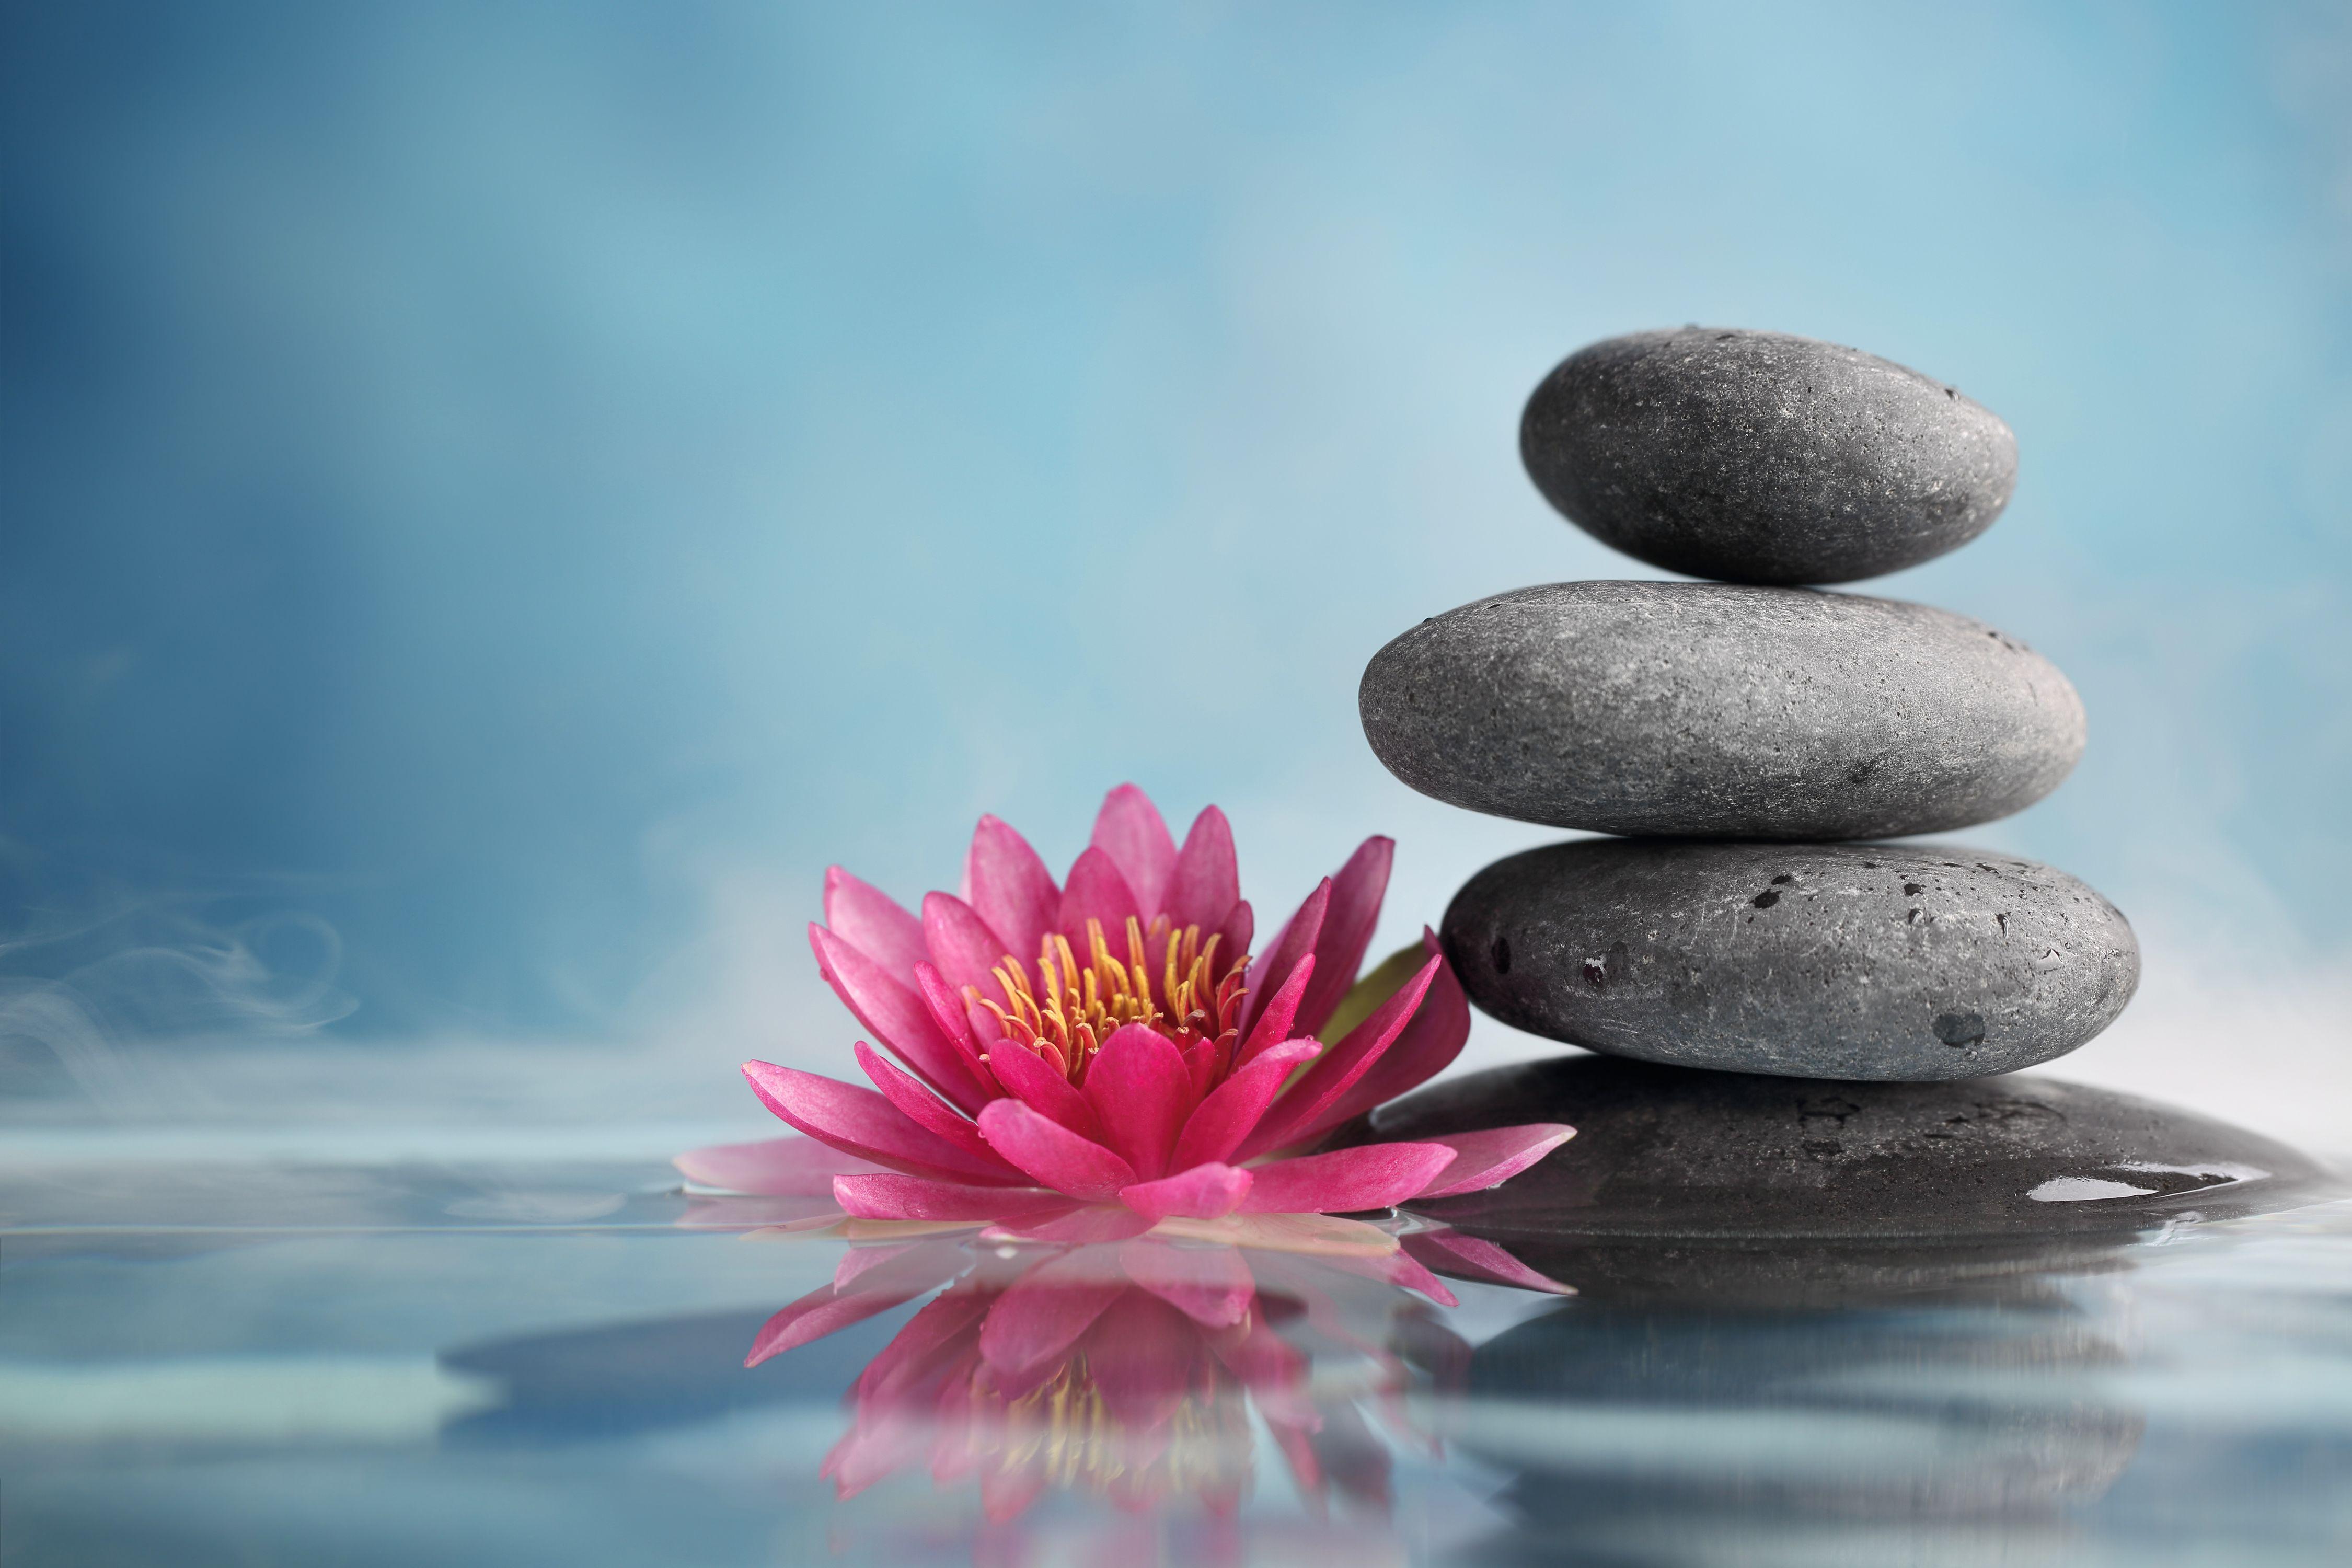 Dzen Lotus flower Lotus symbol of purity and wisdom Pinterest